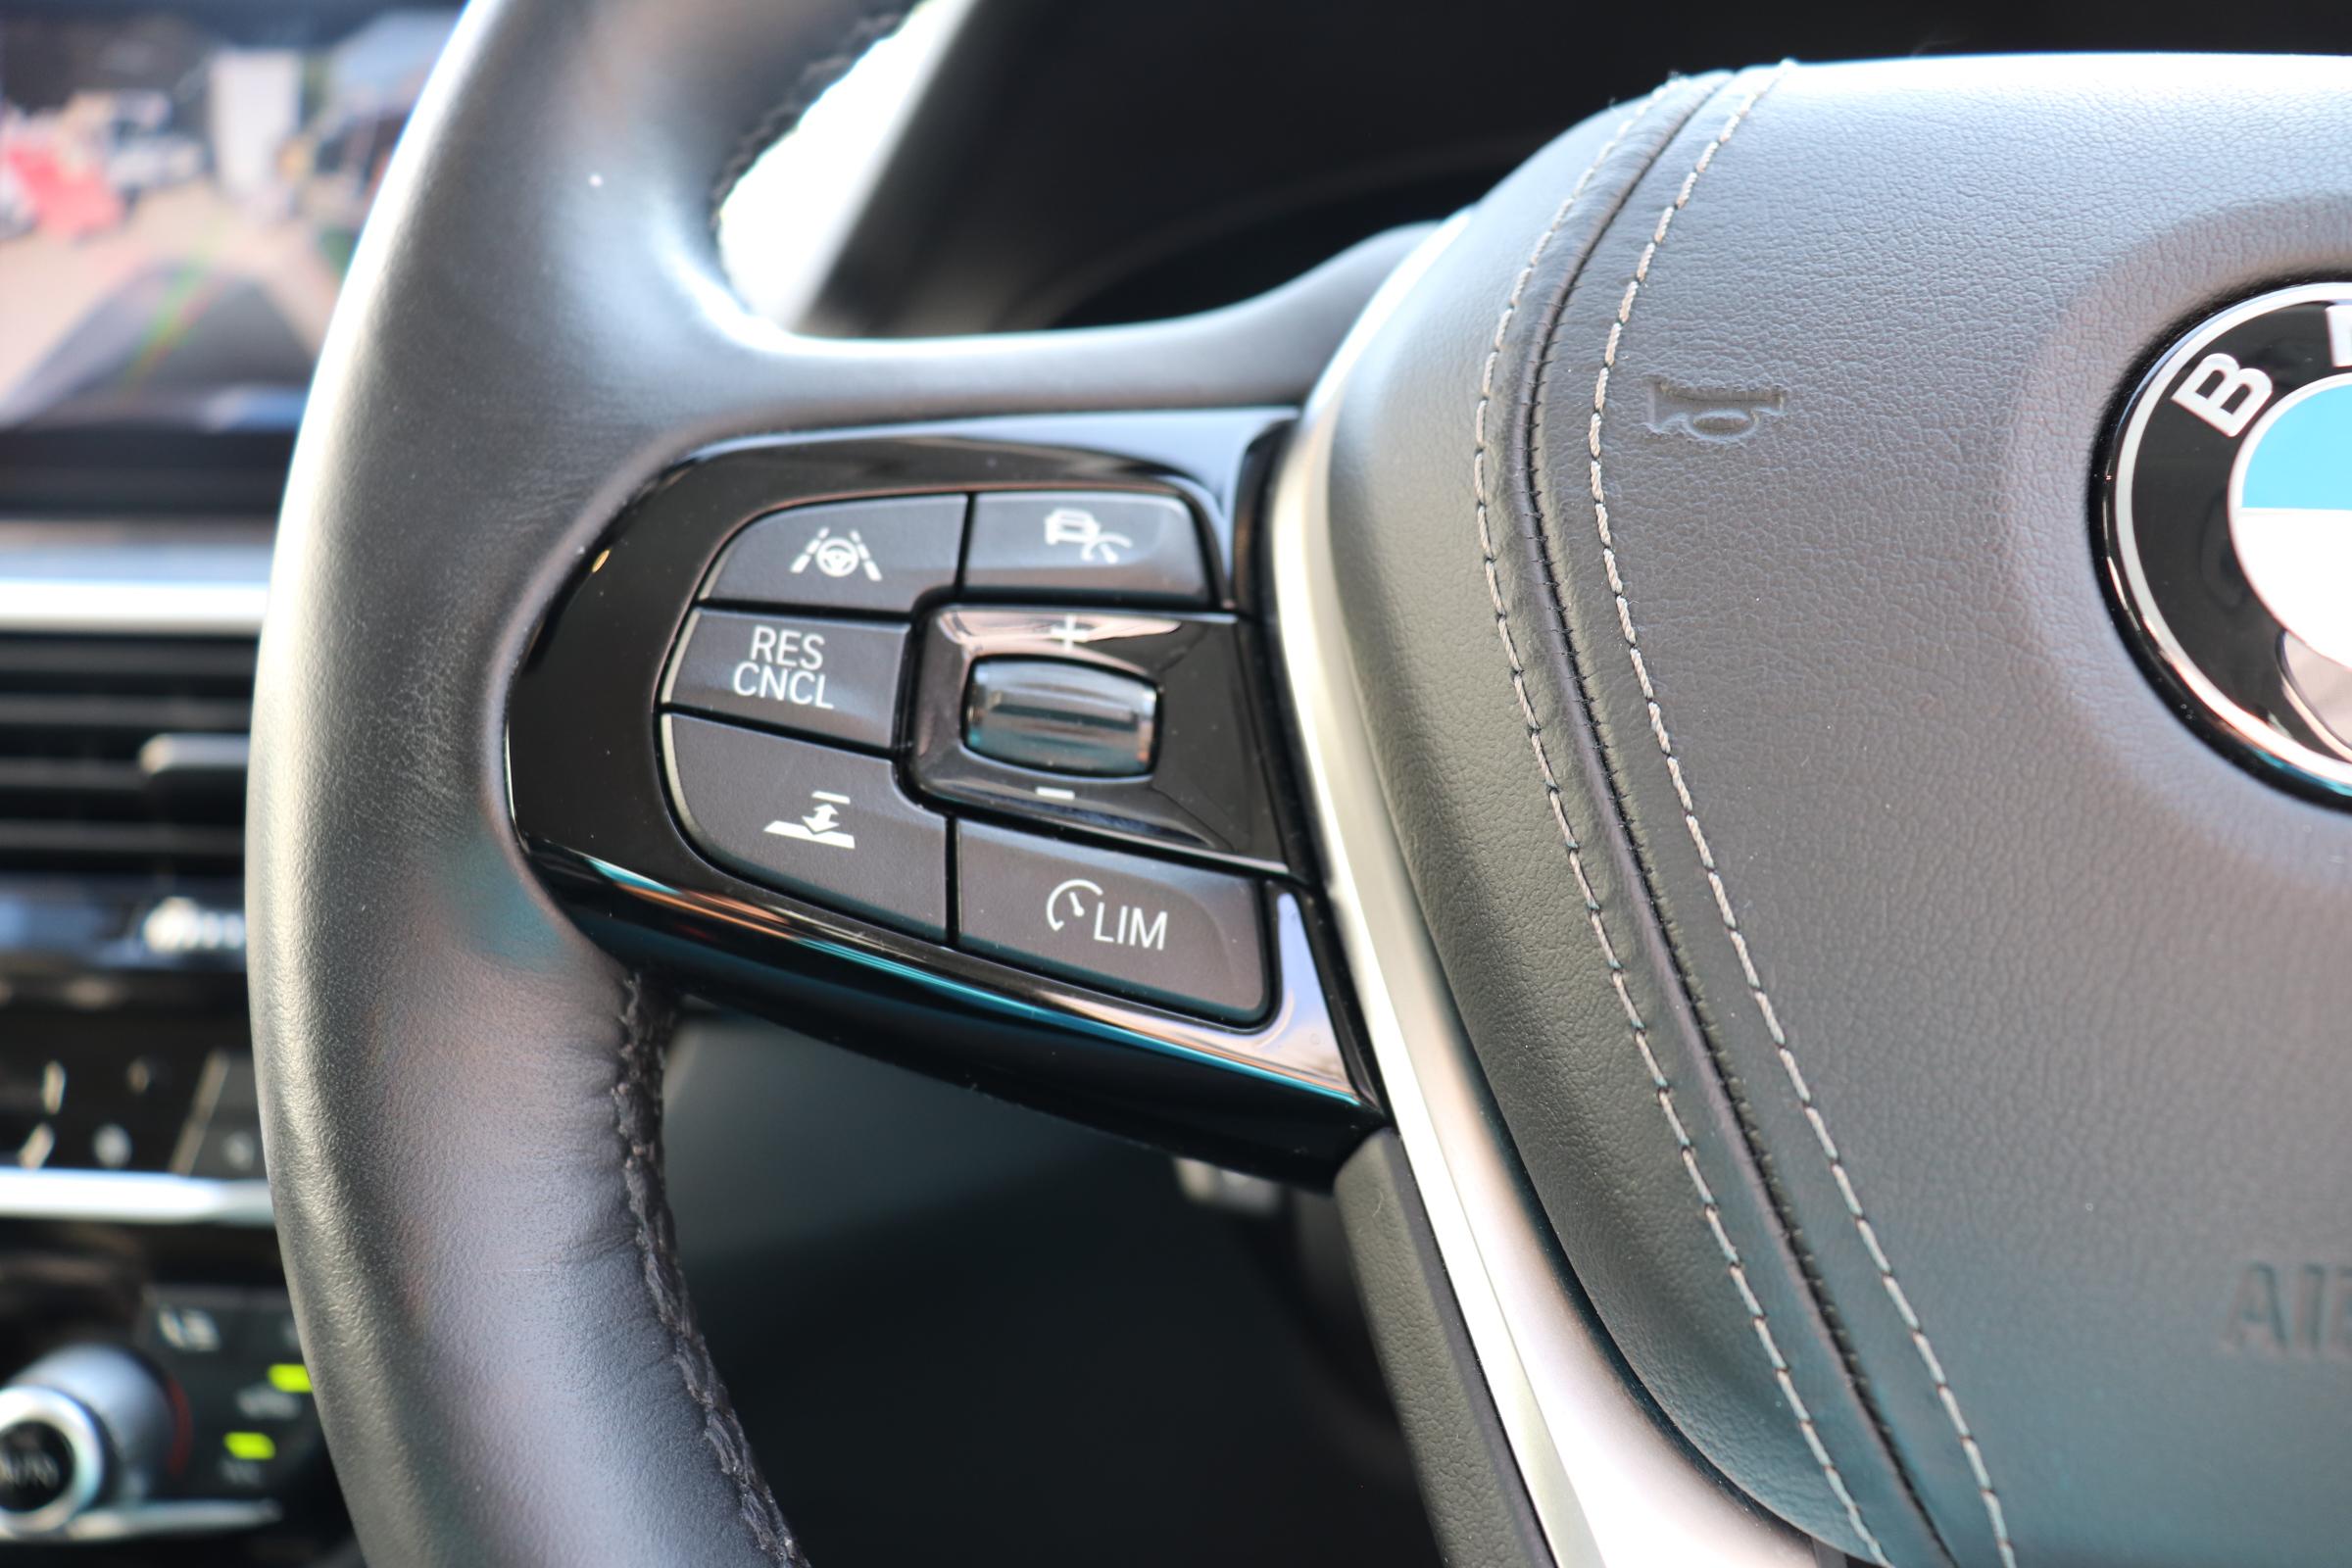 523dツーリング ラグジュアリー BEAMコンプリートカー 黒革 HUD ワンオーナー車両画像13